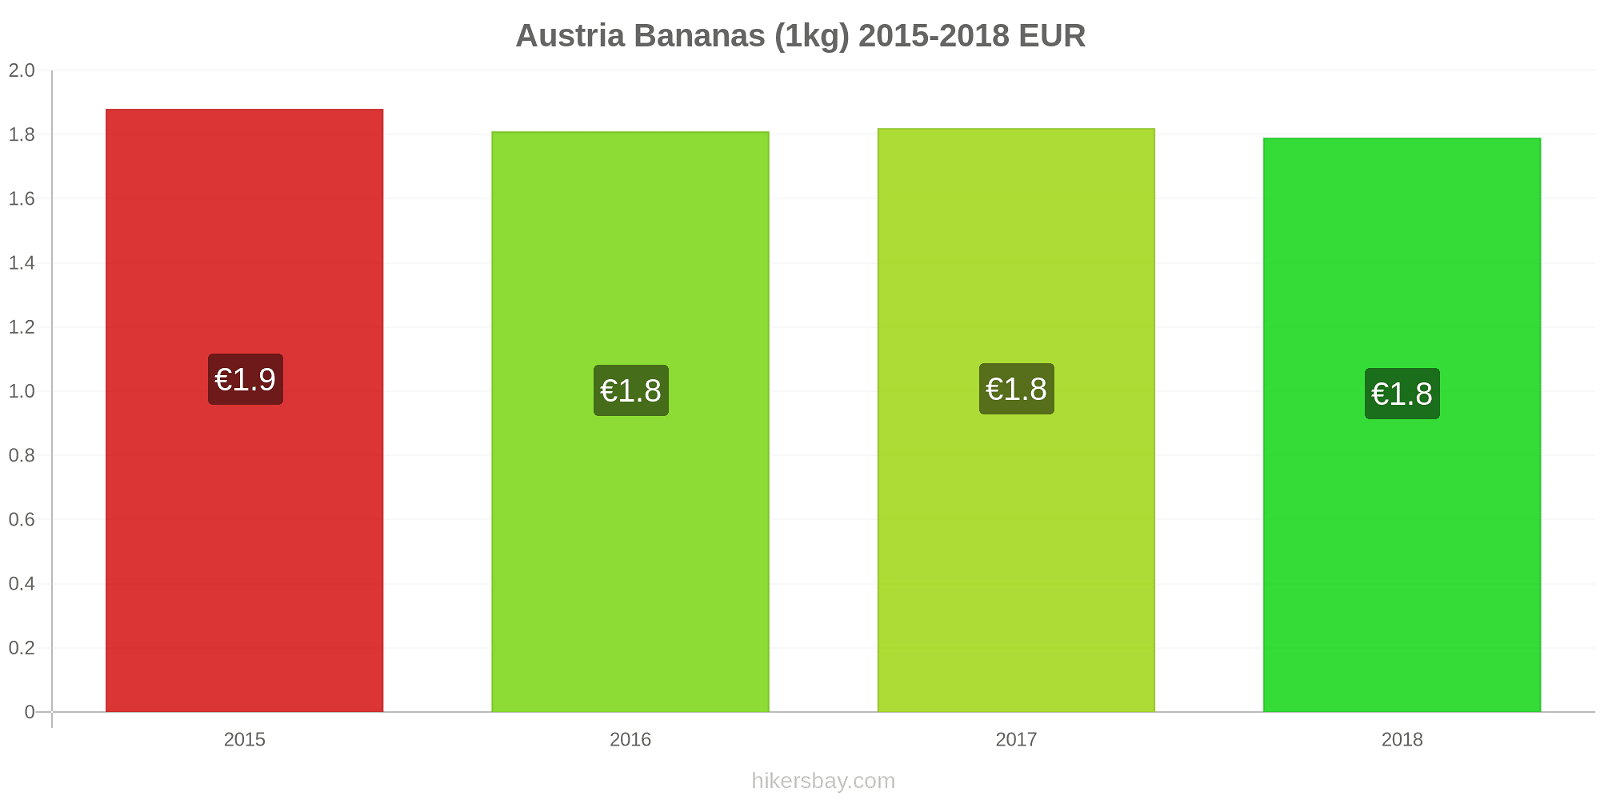 Austria price changes Bananas (1kg) hikersbay.com